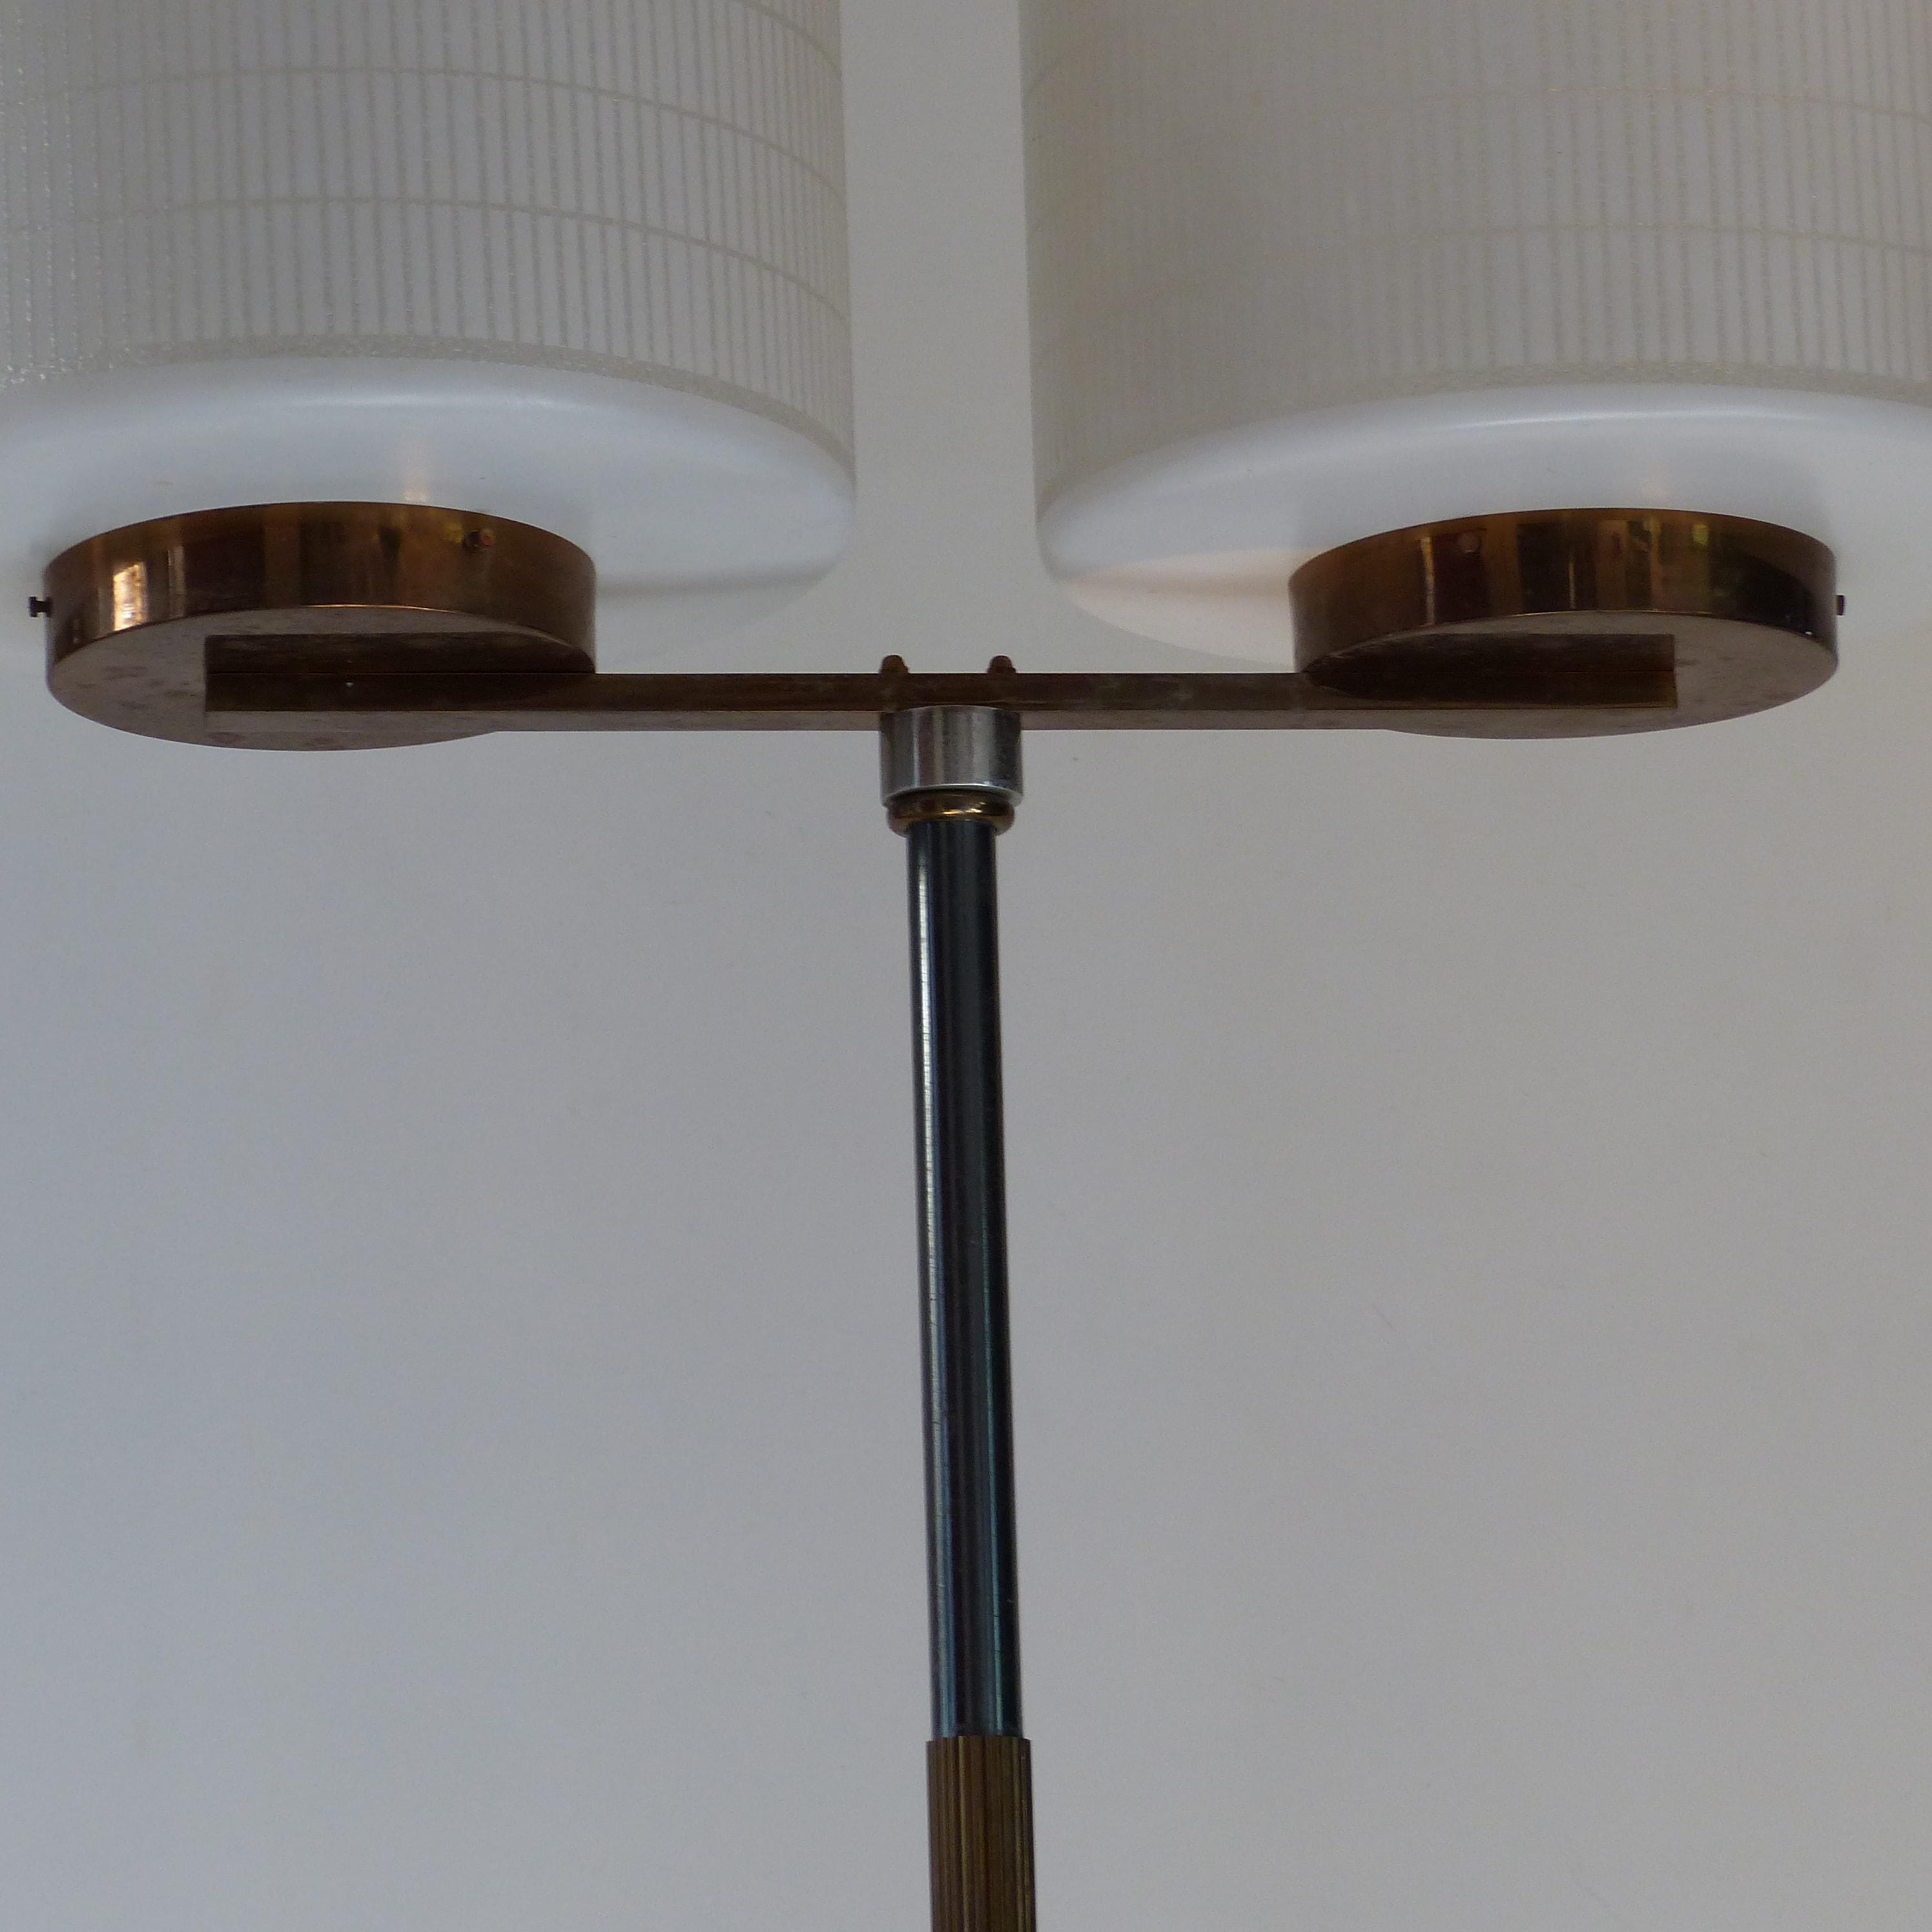 lampadaire vintage lignedebrocante brocante en ligne chine pour vous meubles vintage et. Black Bedroom Furniture Sets. Home Design Ideas